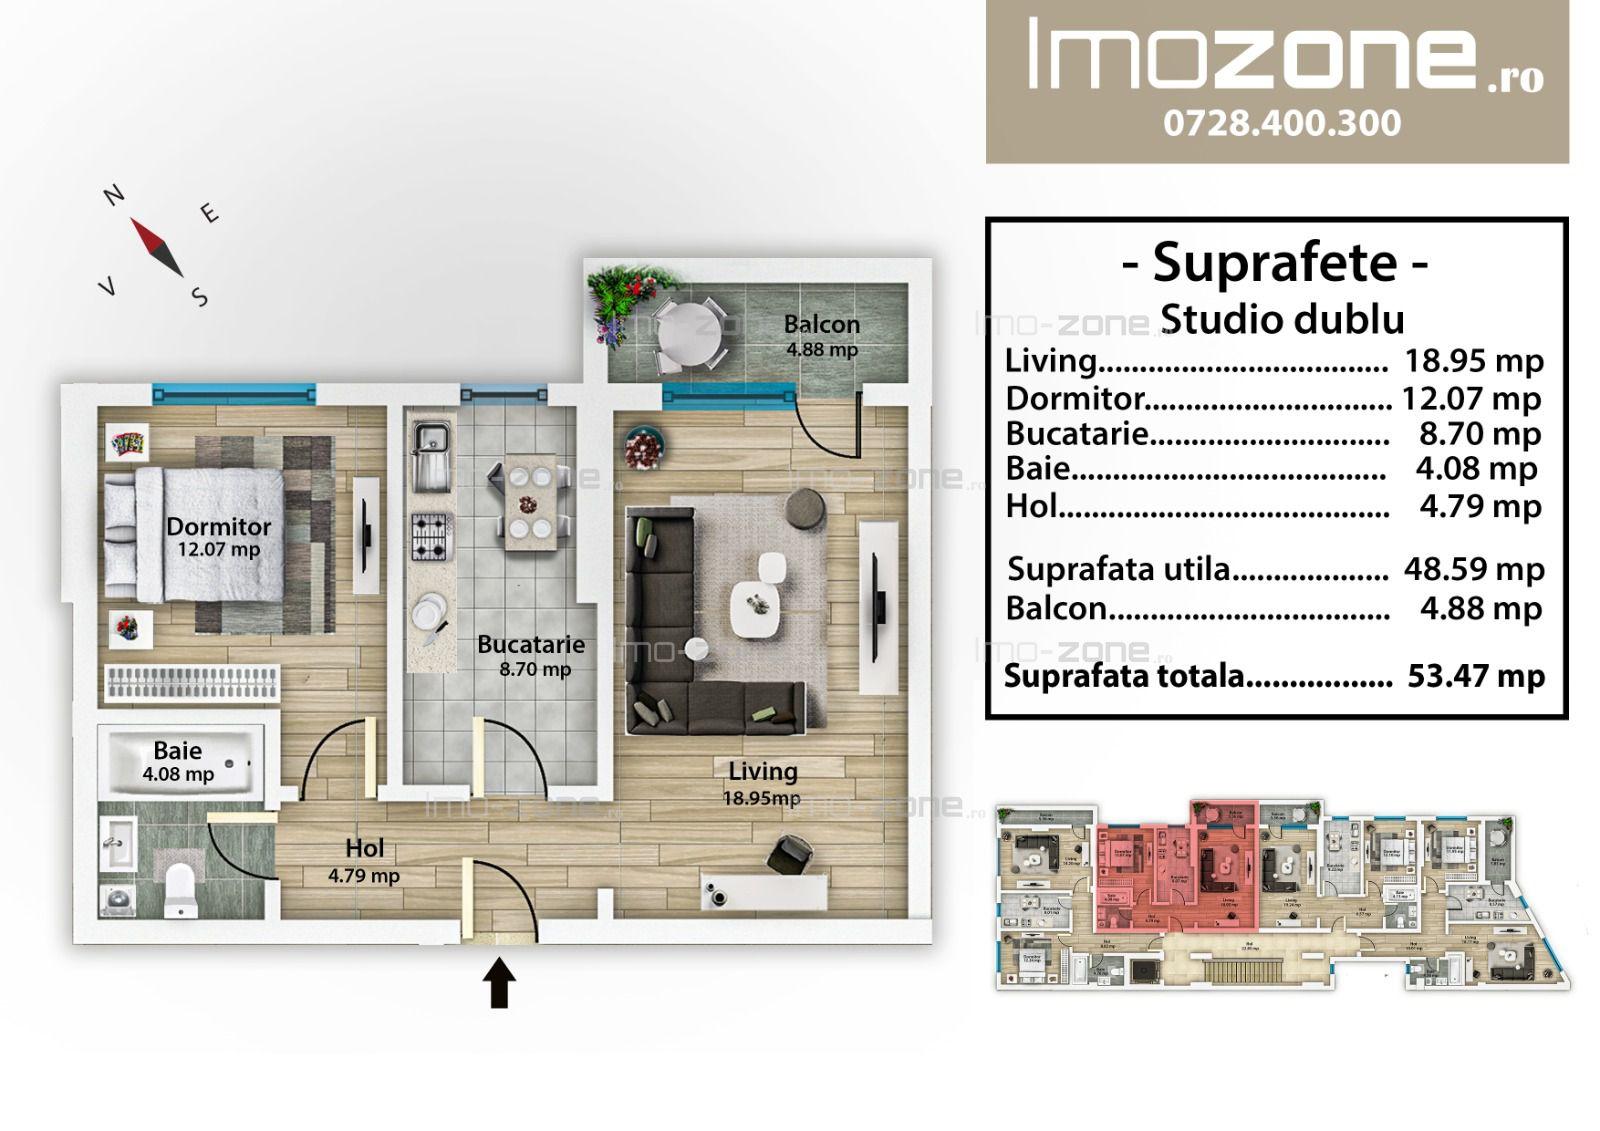 Bloc Nou, Mall Plaza, 2 camere, decomandat, etaj 2, bucatarie inchisa, balcon